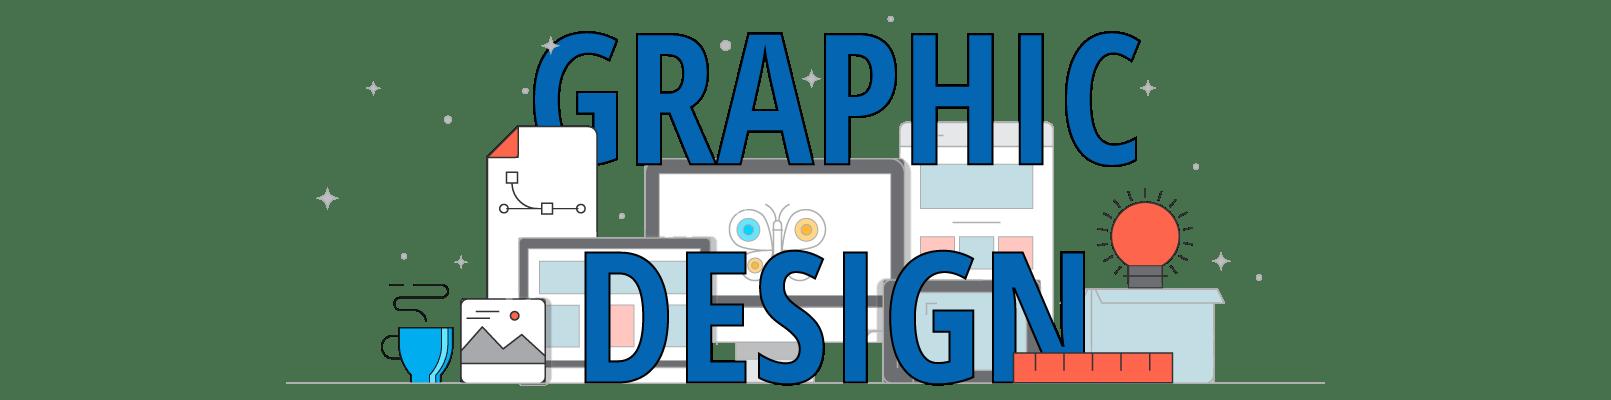 seek social graphic design header with transparent background